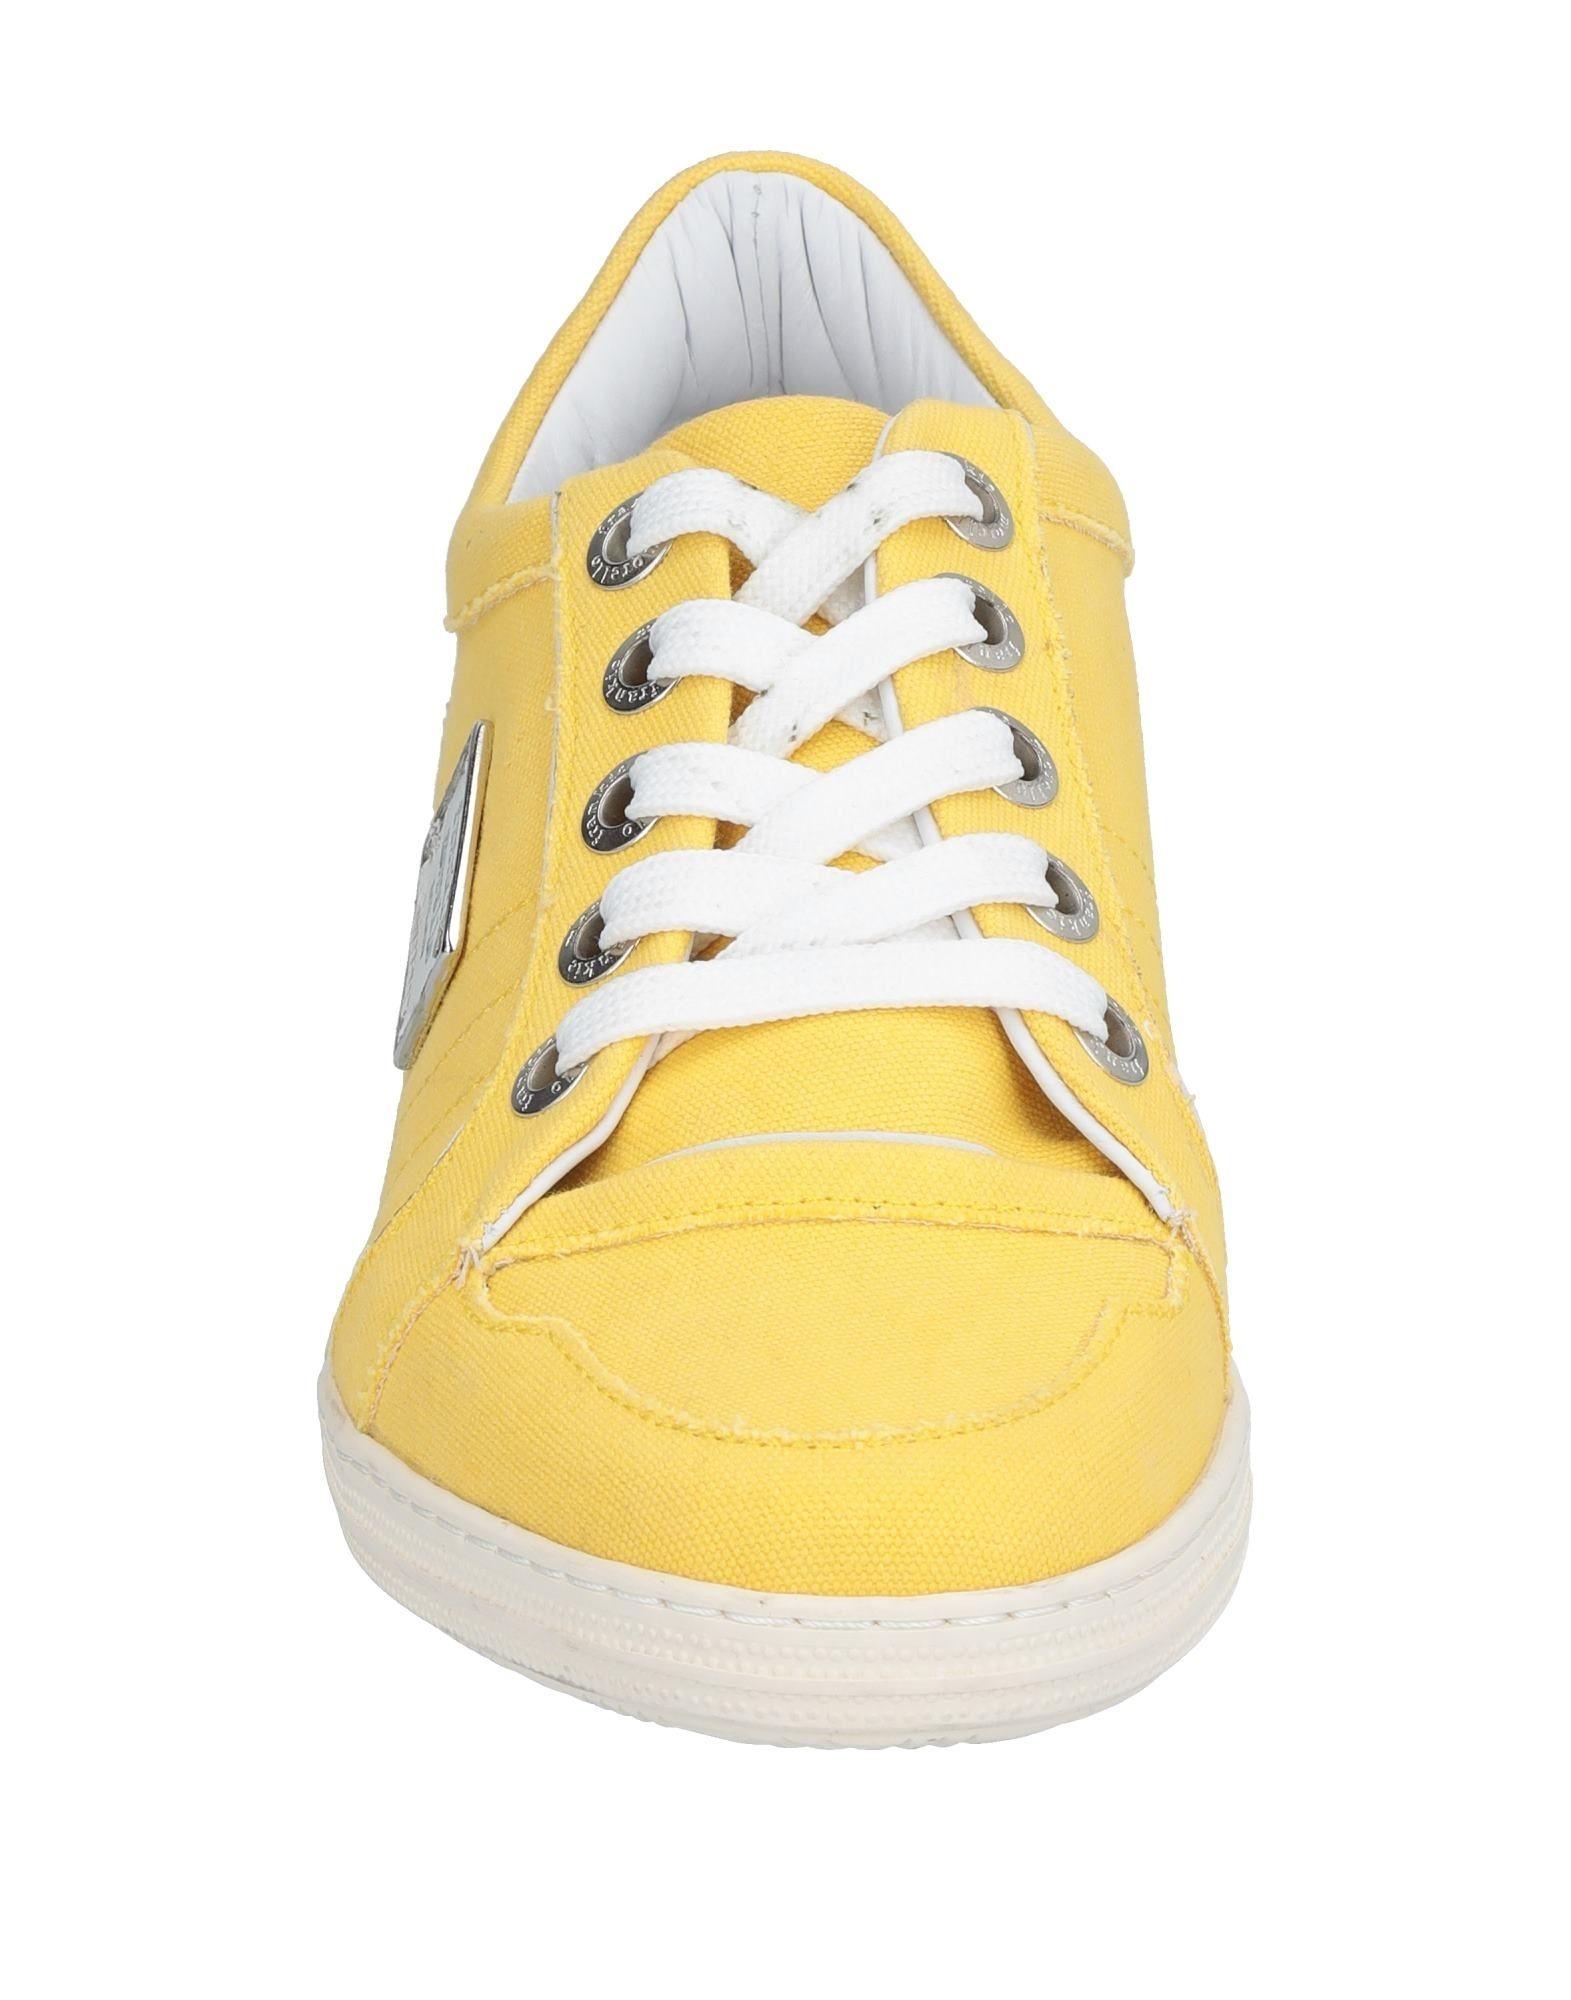 Frankie Morello Sneakers Sneakers Morello Herren  11538430JB Neue Schuhe 7125c4